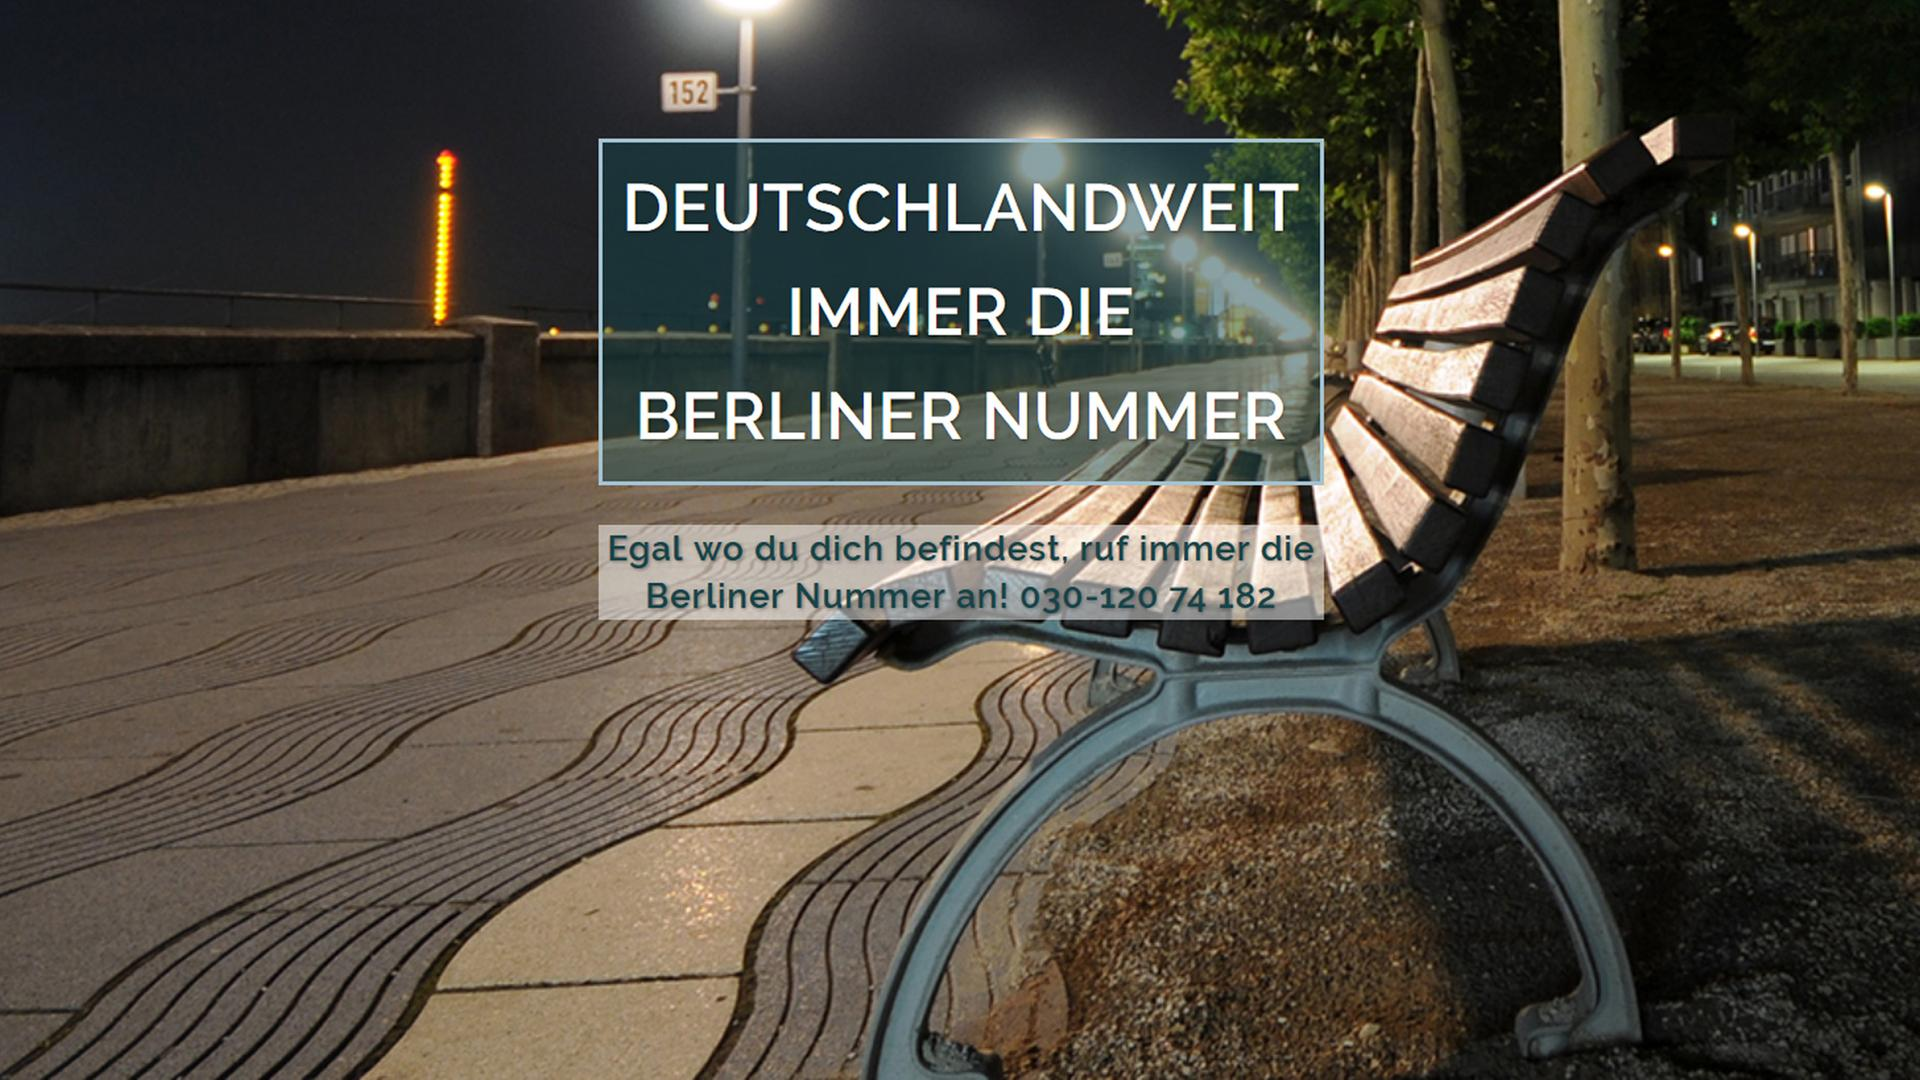 Marktplatz F-Droid: Zehn freundliche Android-Apps - ZDFmediathek